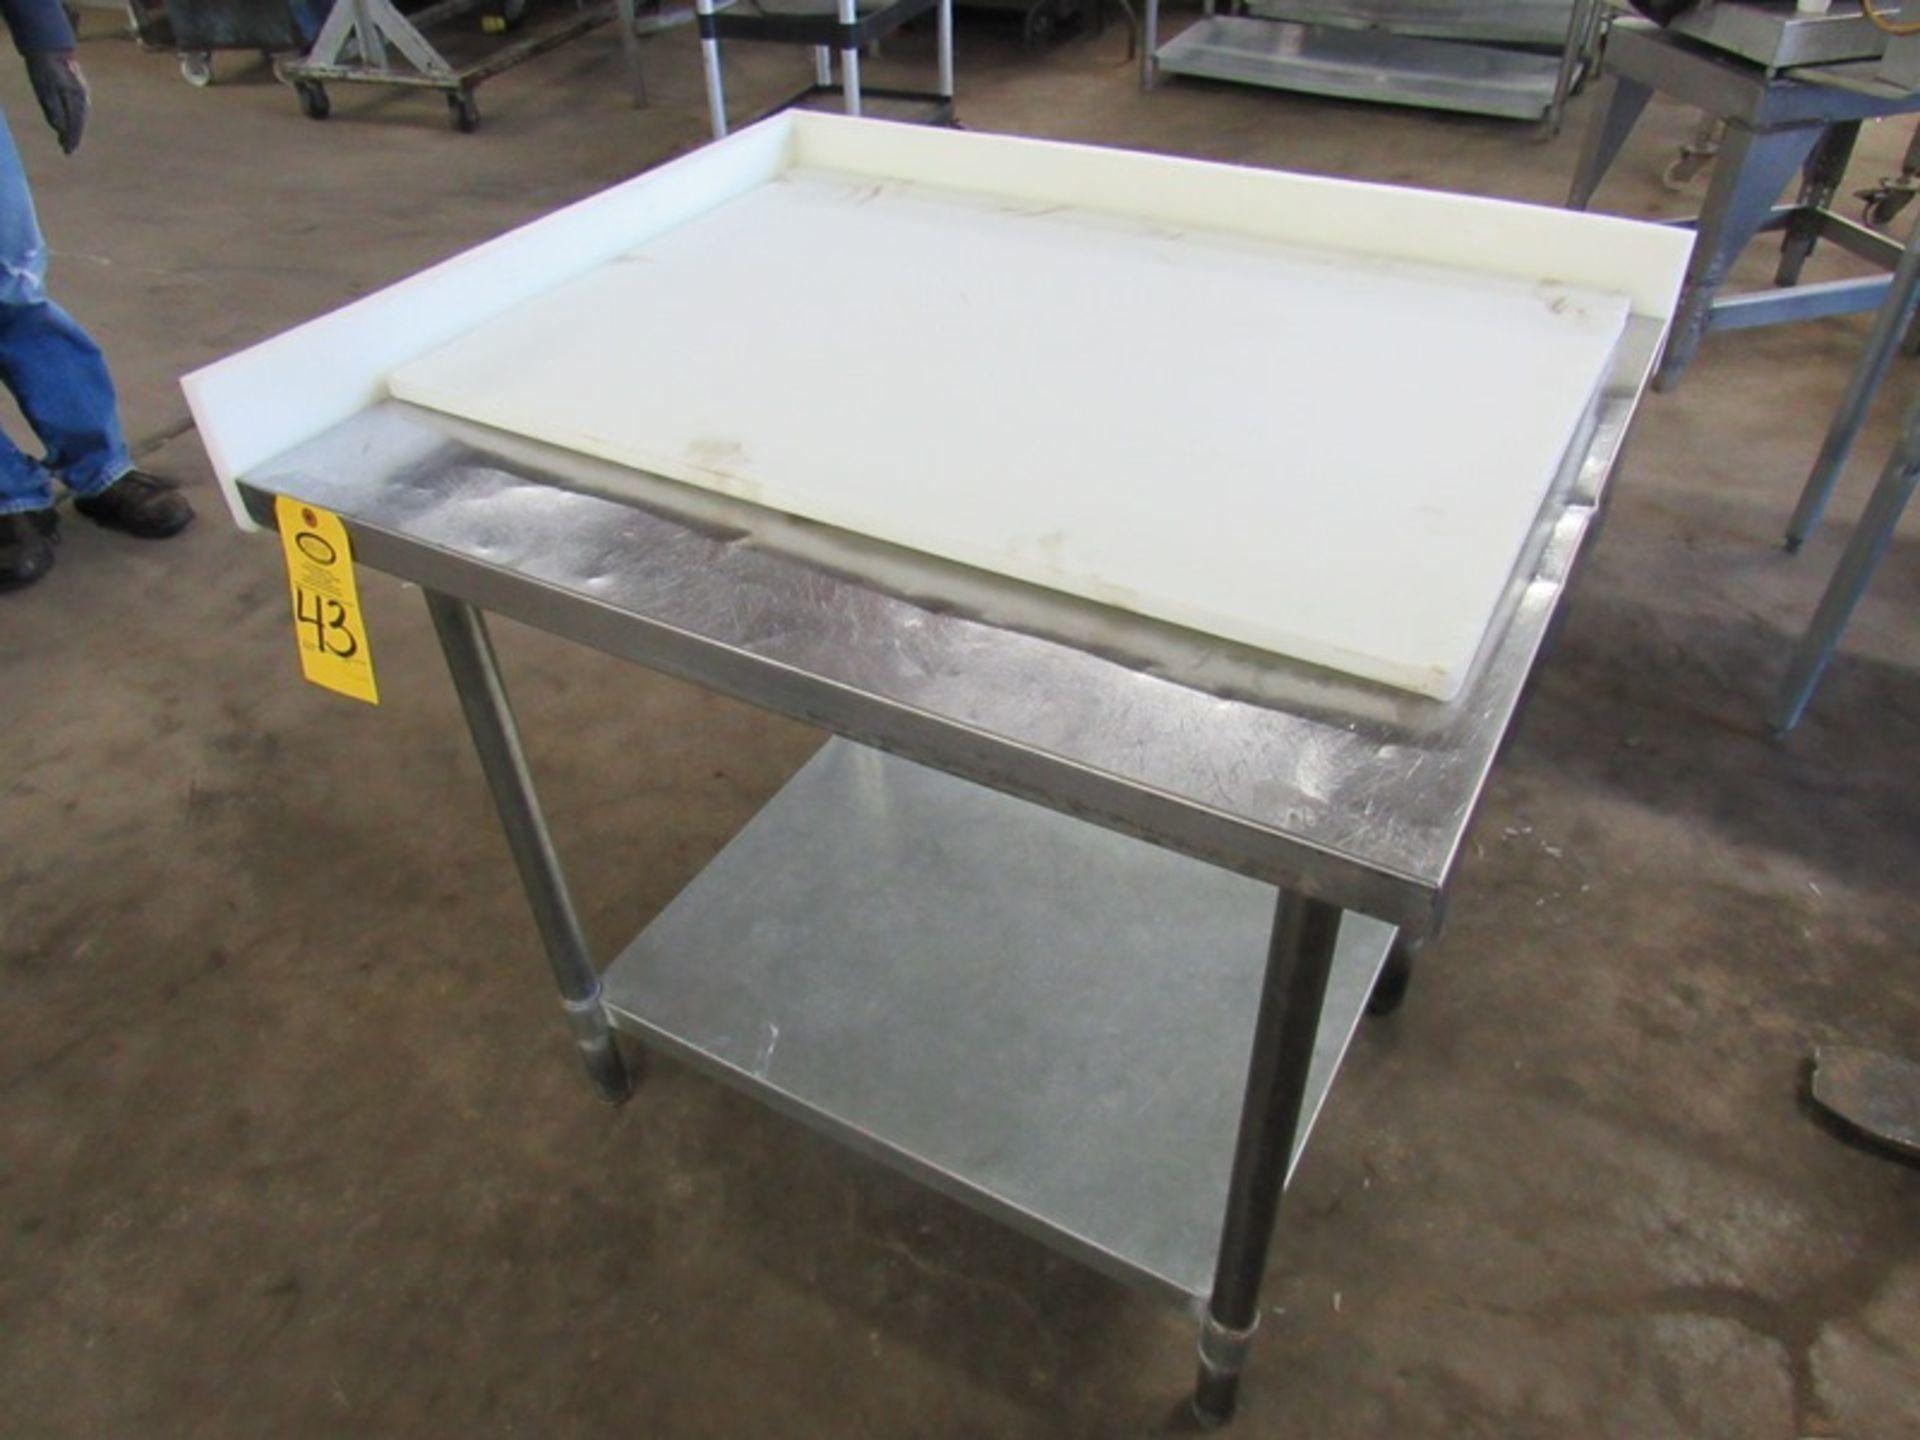 "Lot 43 - Lot (2) Stainless Steel Tables, (1) 30"" W X 36"" L X 36"" T with bottom shelf (1) 30"" W X 36"" L X"